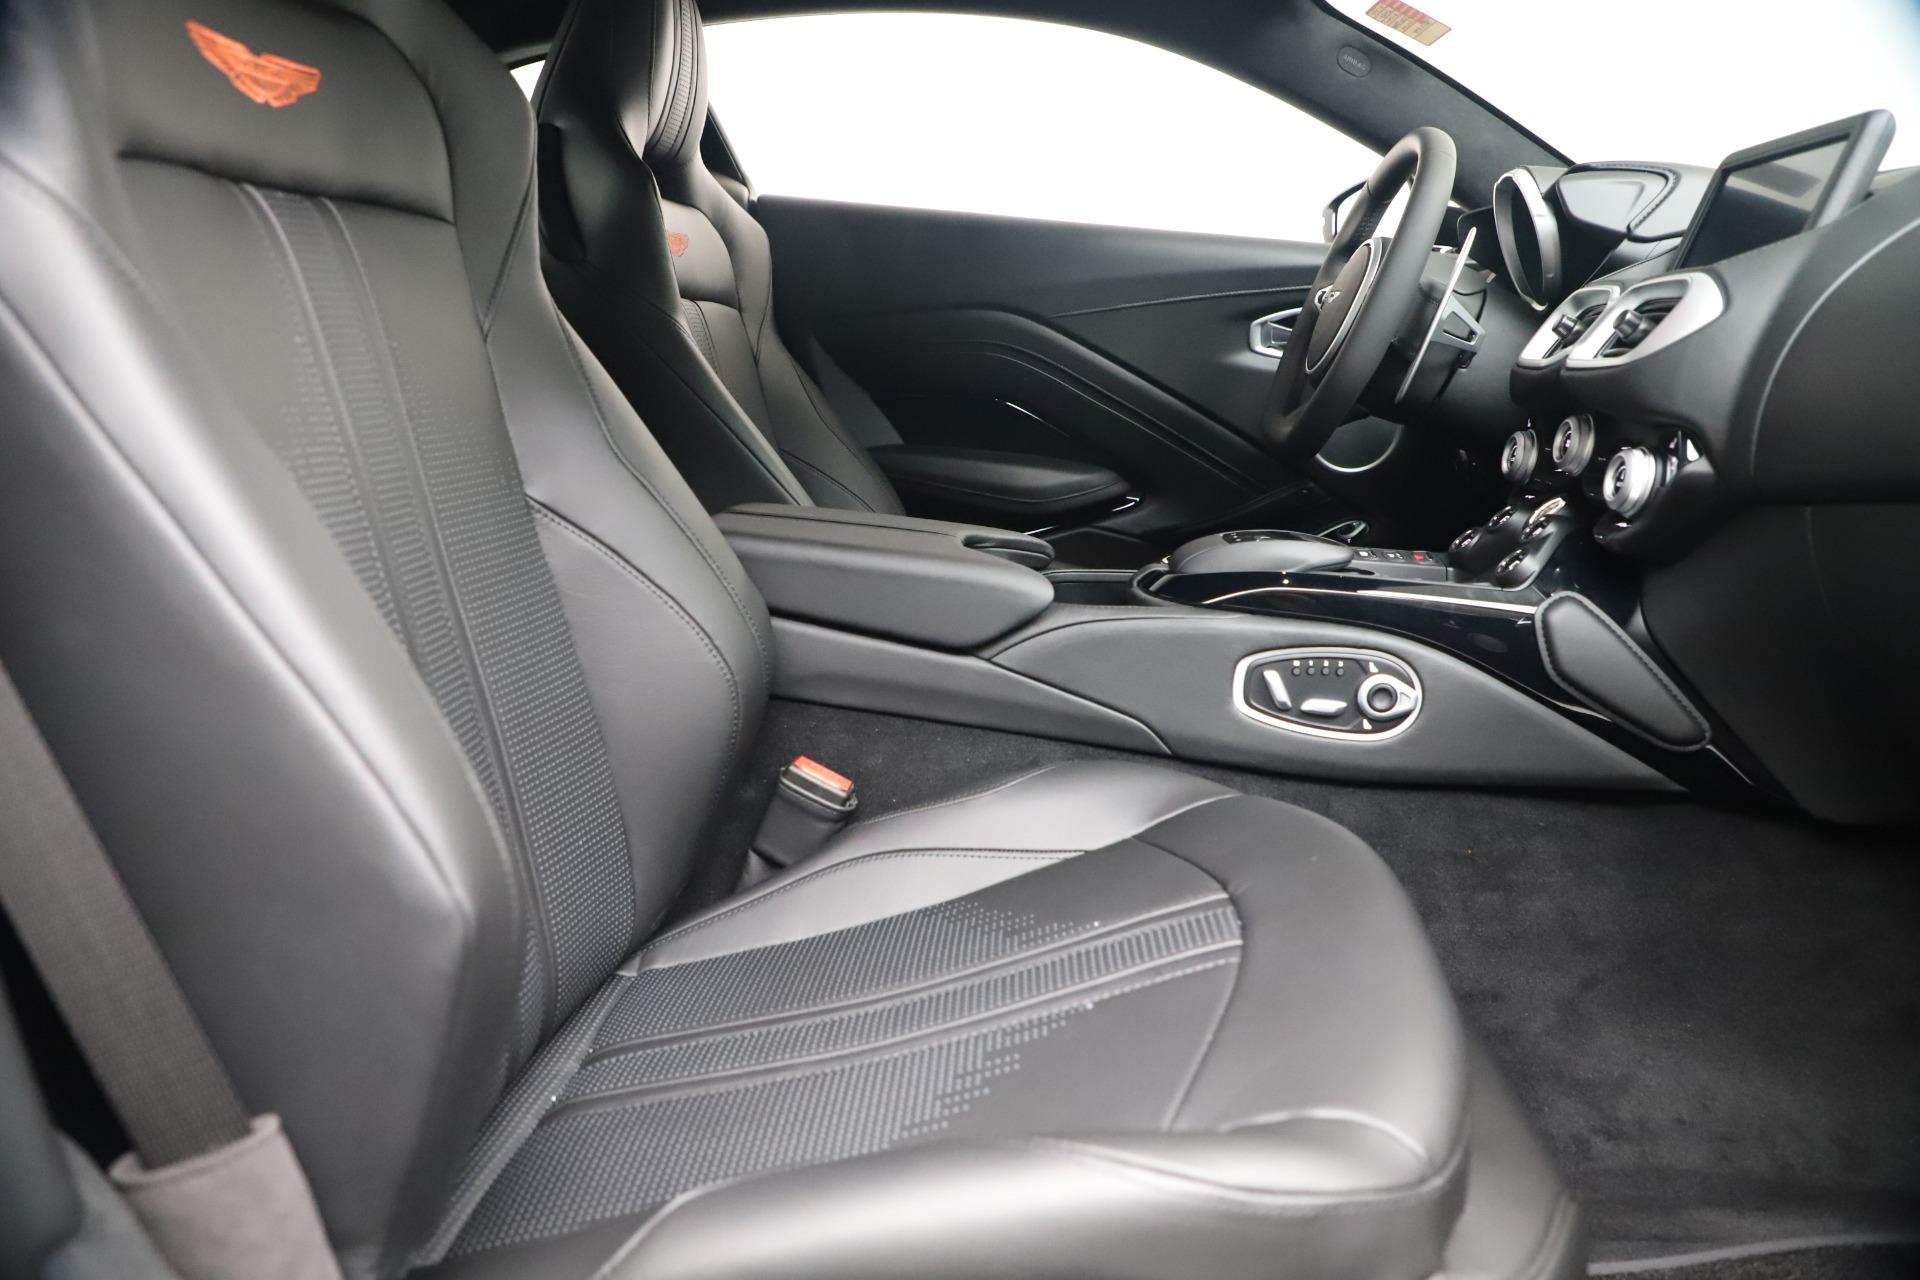 New 2020 Aston Martin Vantage V8 For Sale 193154 In Greenwich, CT